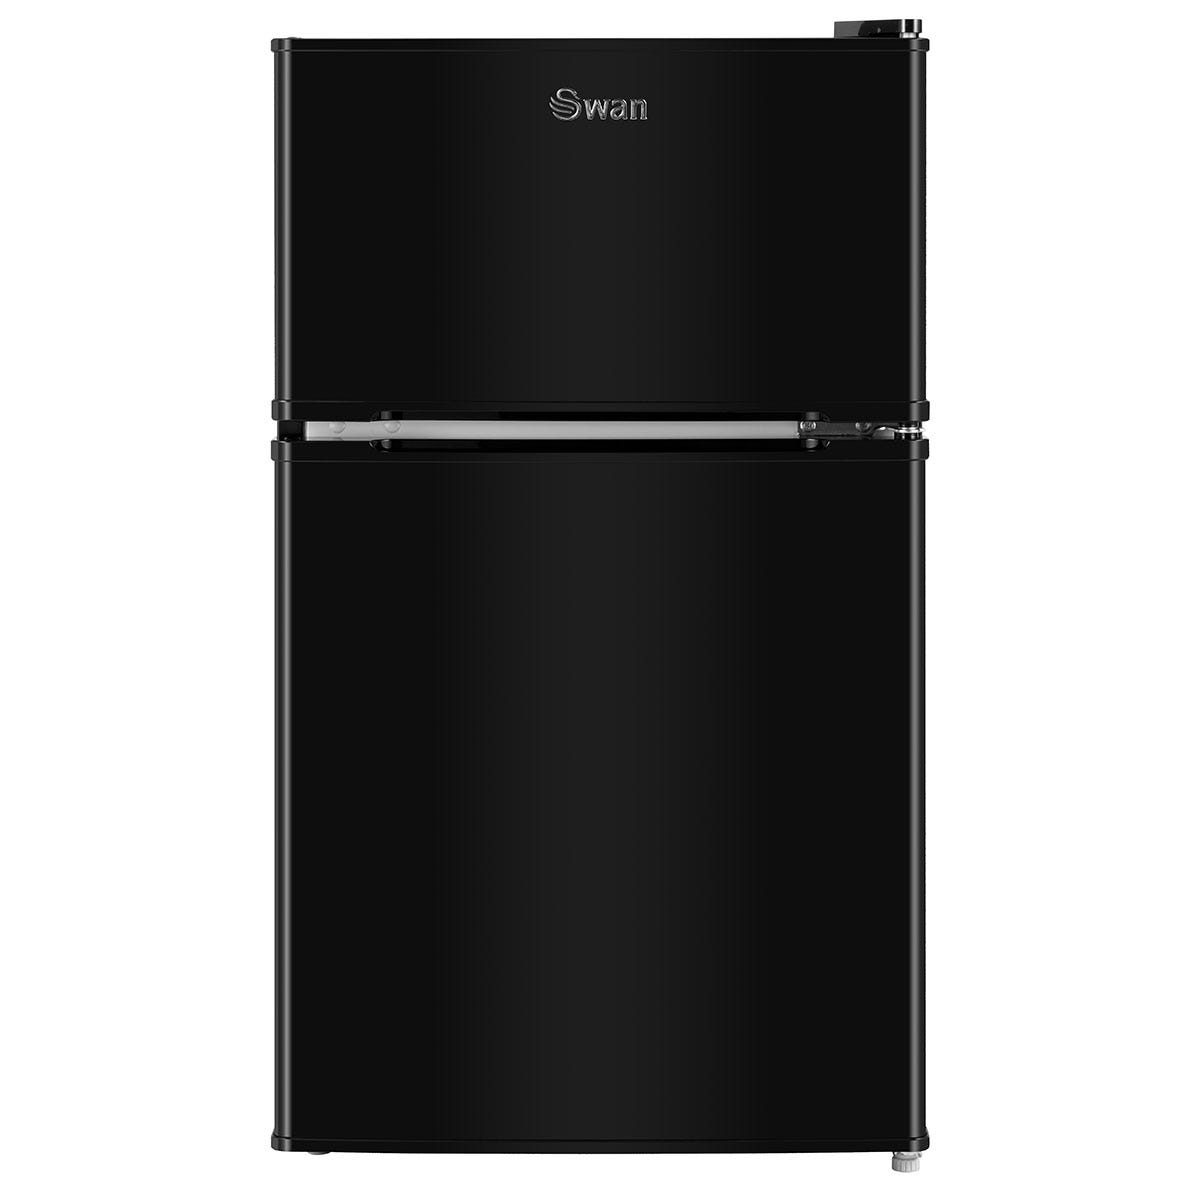 Swan SR75040BLKN 87L Under-Counter Fridge Freezer - Black